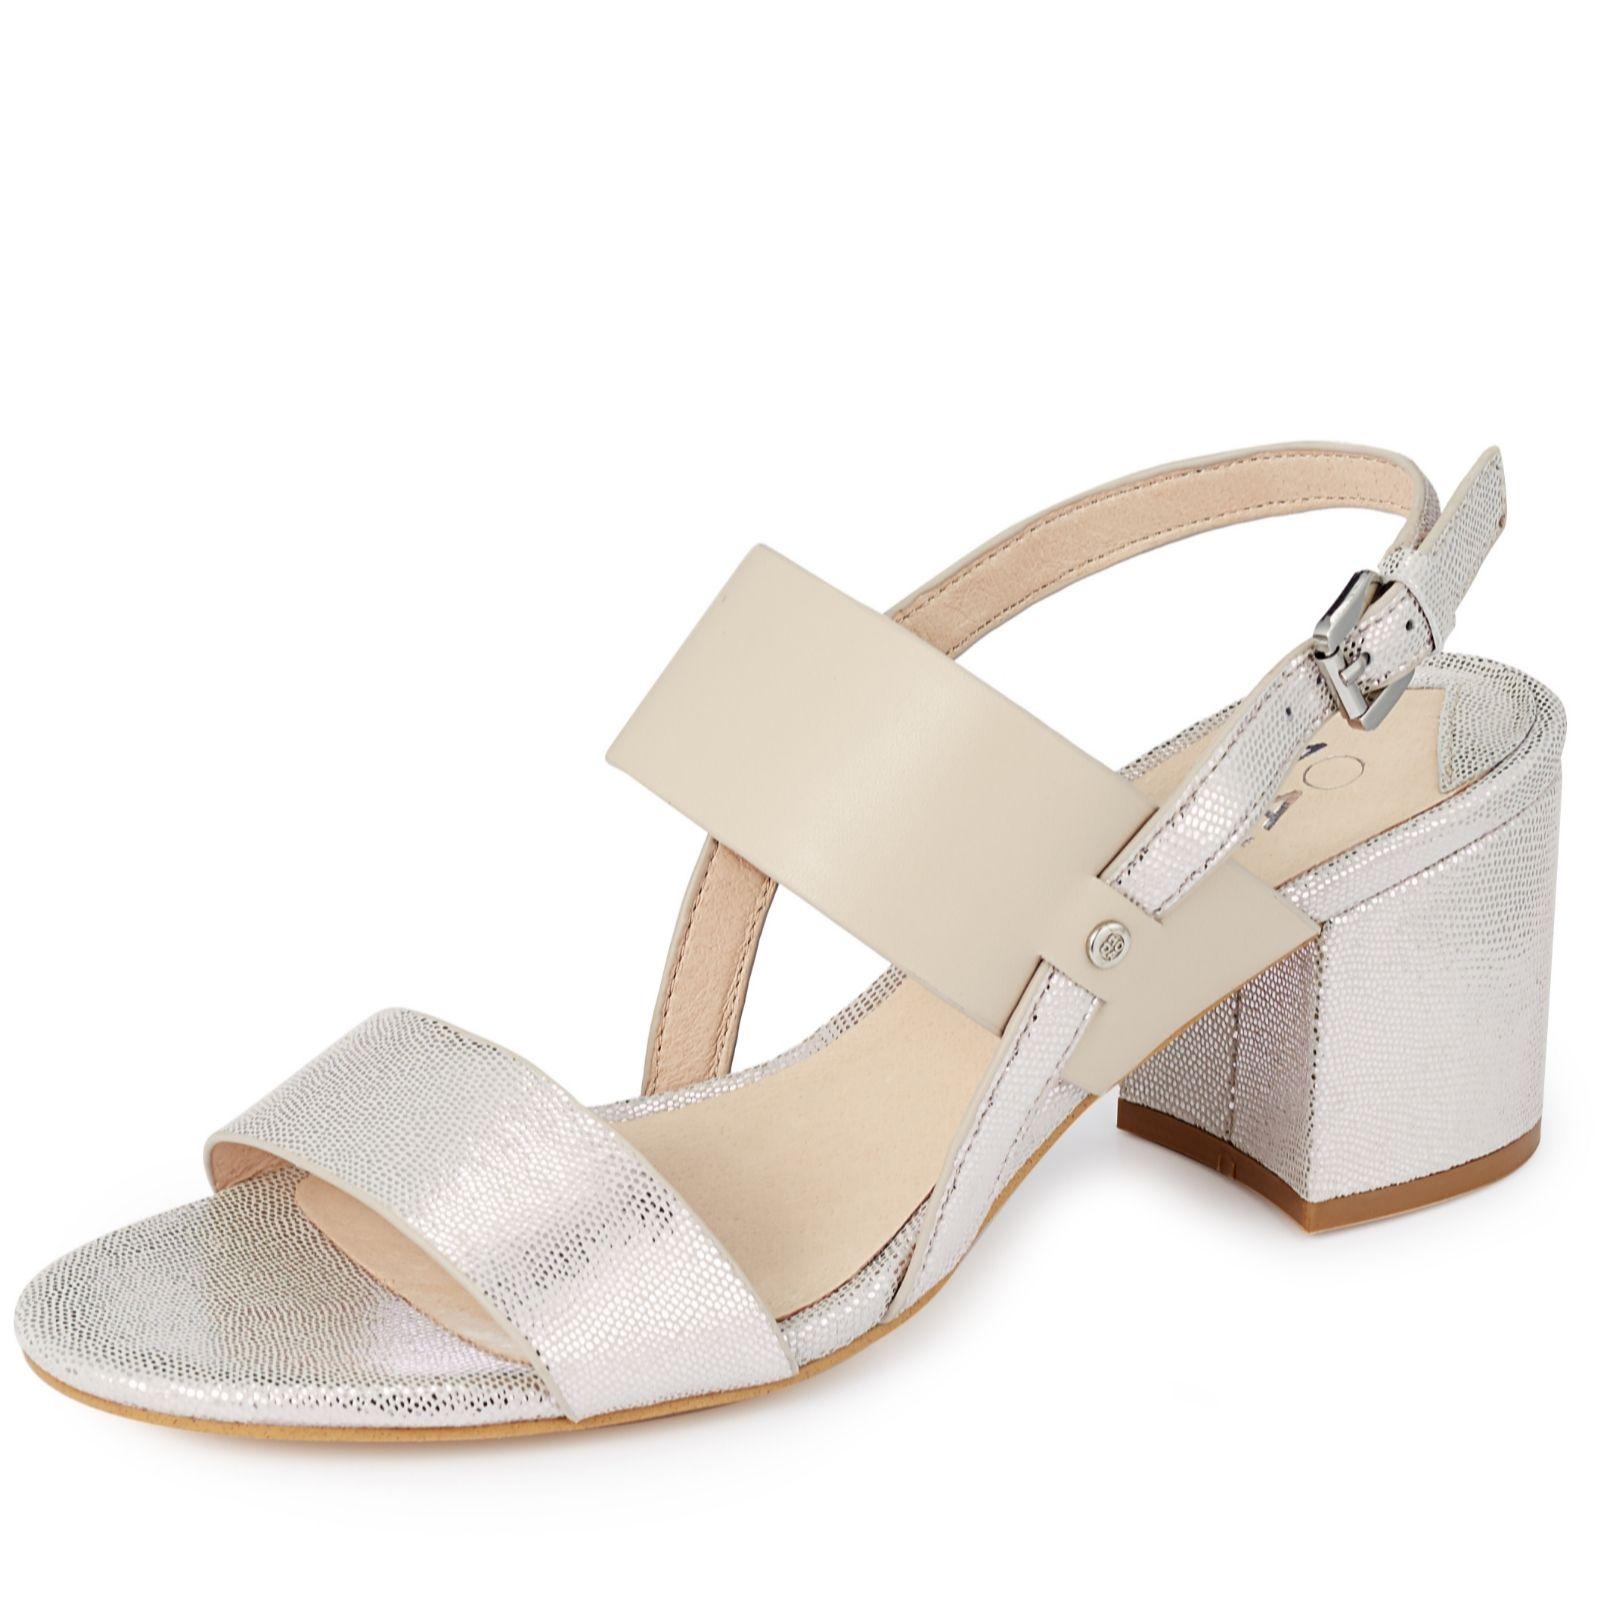 Vegan Will's Block E 8 Shoes Heels Uk 42 K1lFJTc